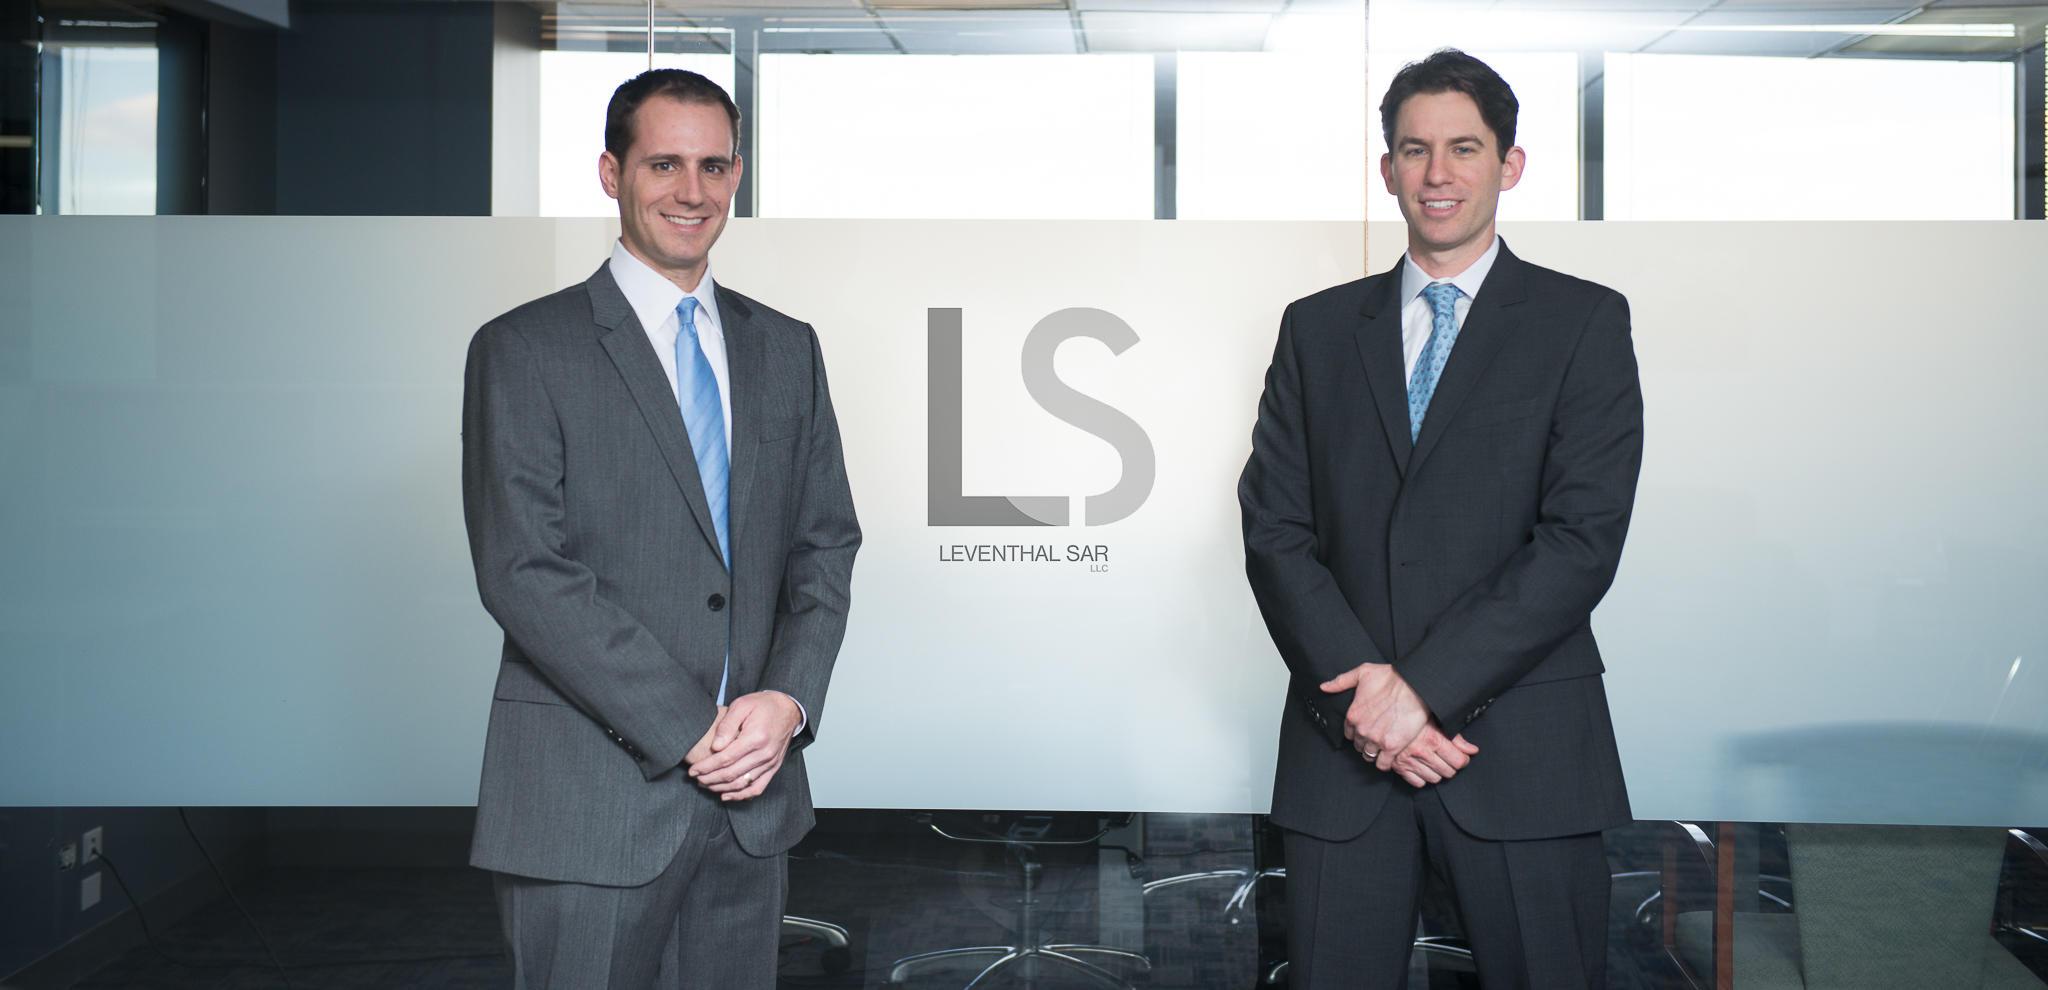 Leventhal Sar LLC